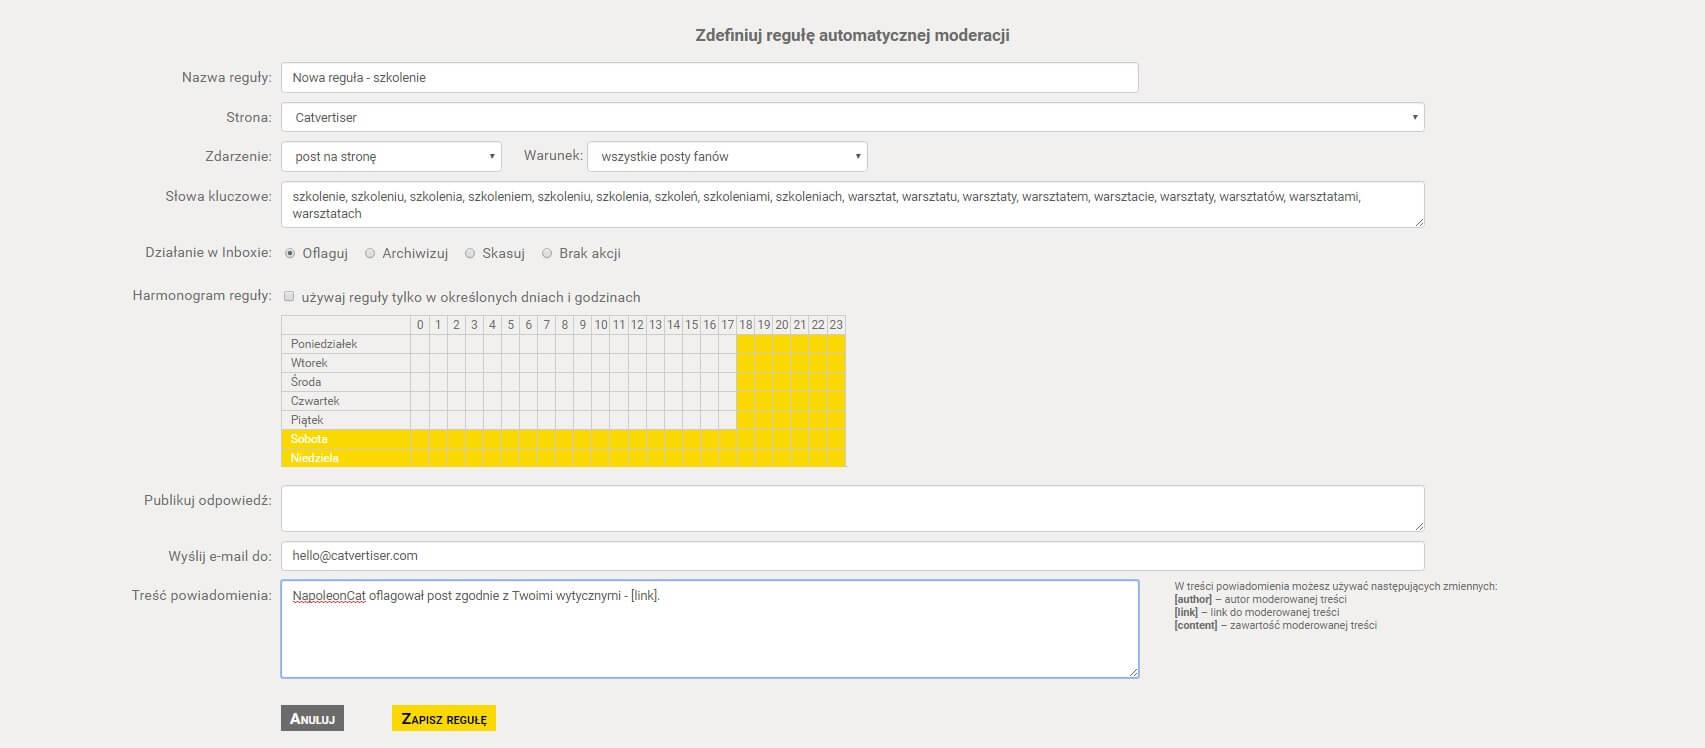 Automatyczna moderacja treści na Facebooku - ustawianie reguły automatycznej moderacji treści w NapoleonCat.com